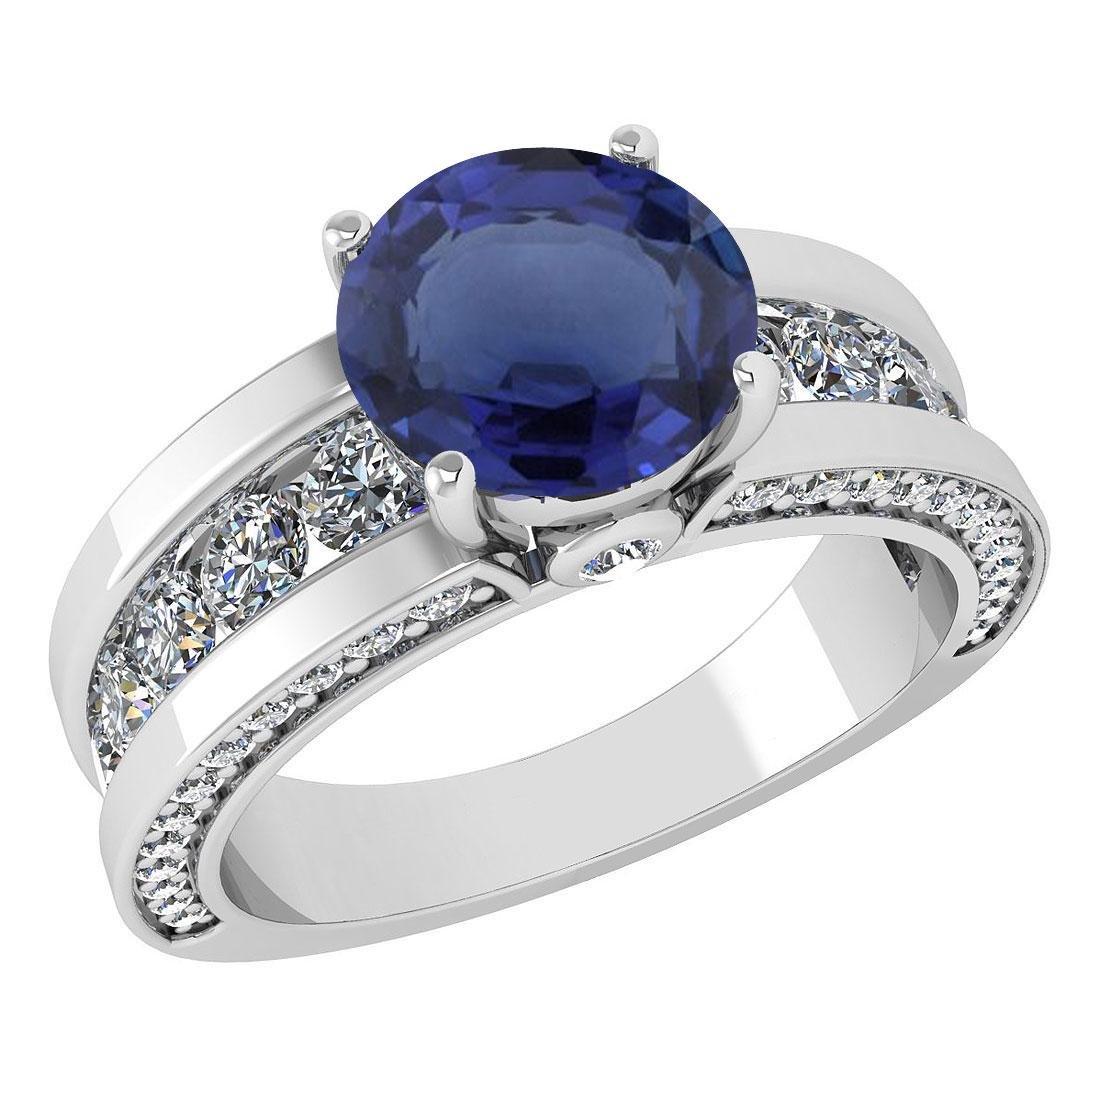 Certified 2.25 Ctw Blue Sapphire And Diamond Wedding/En